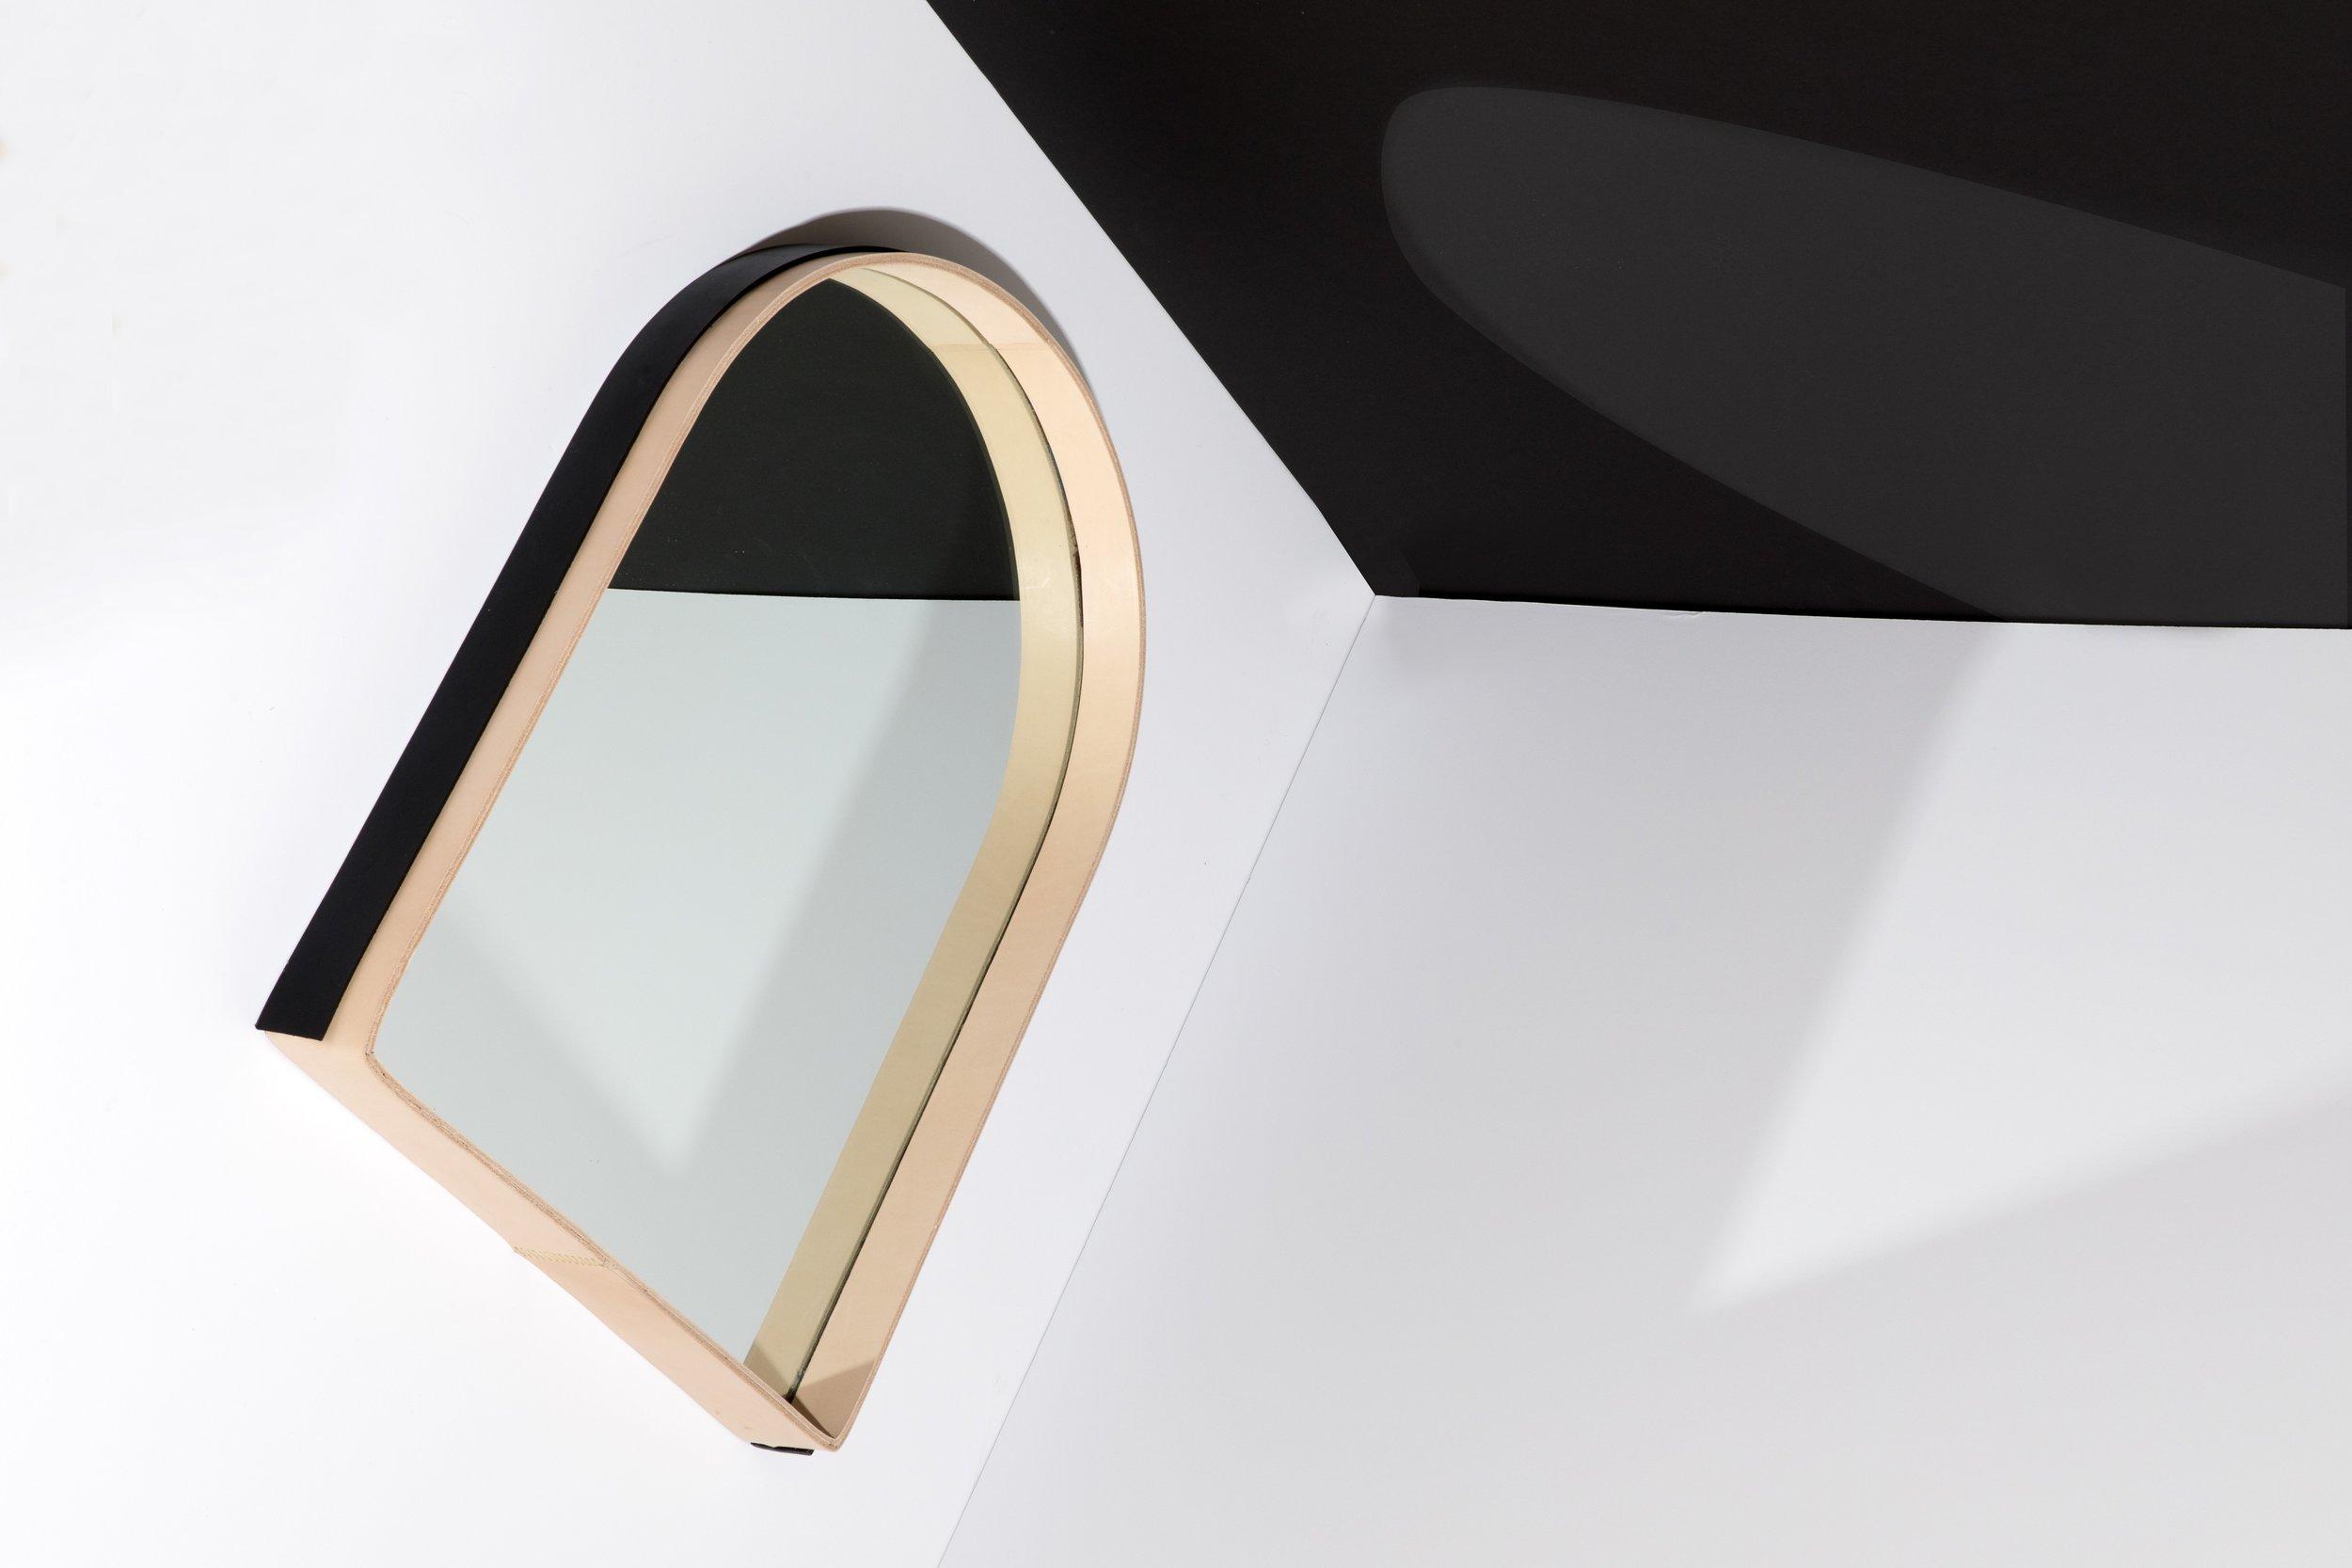 Arch Mirror_Materials + Process.jpg